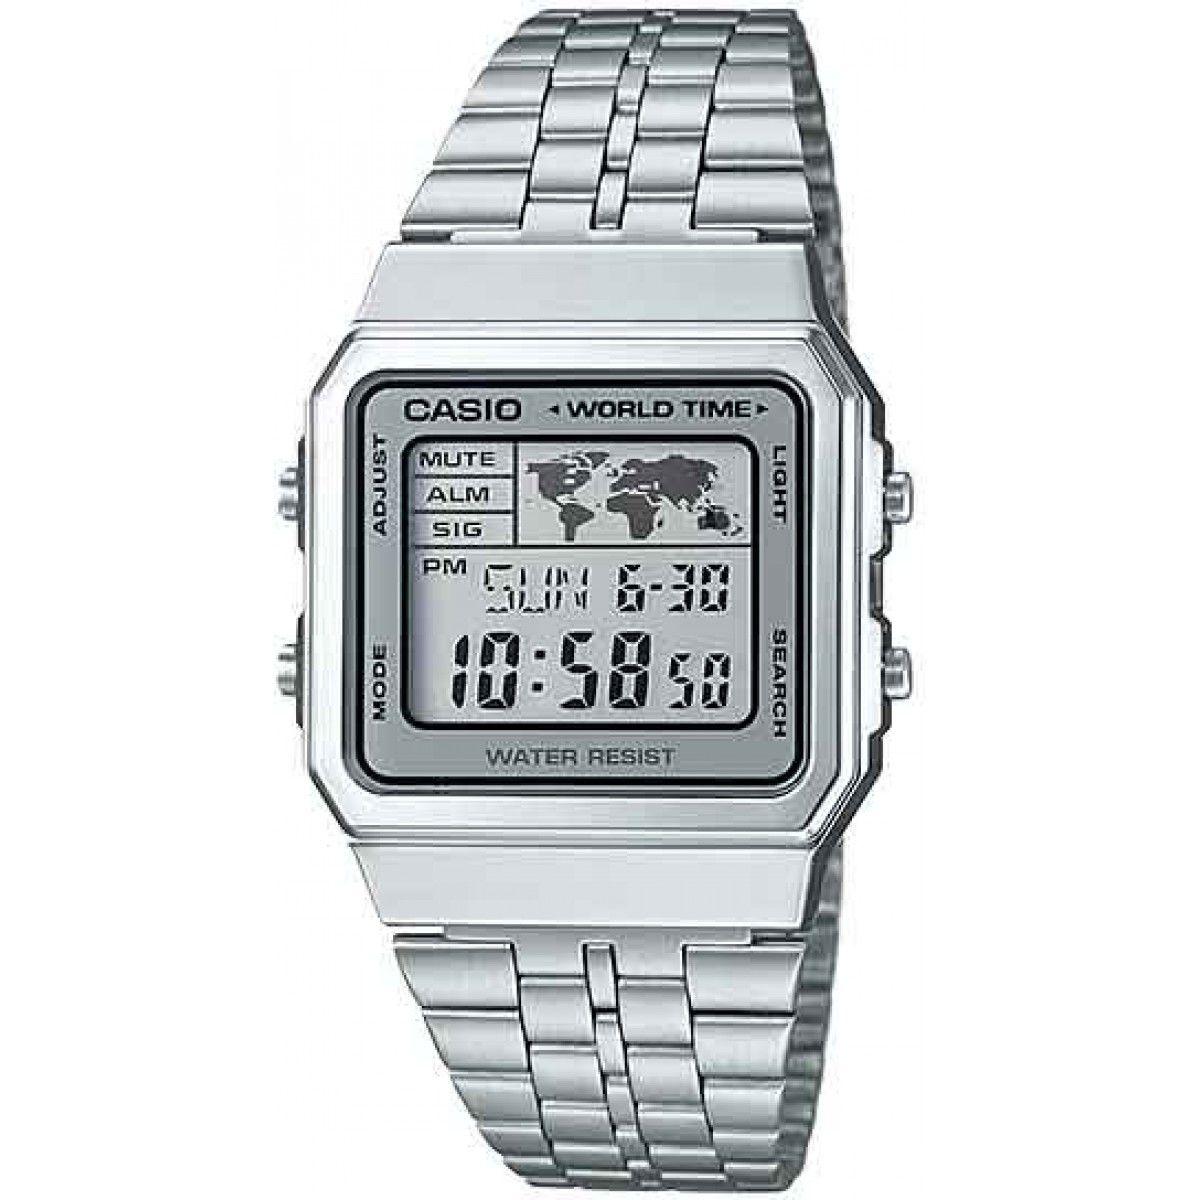 Relógio Casio Vintage World Time A500WA-7DF